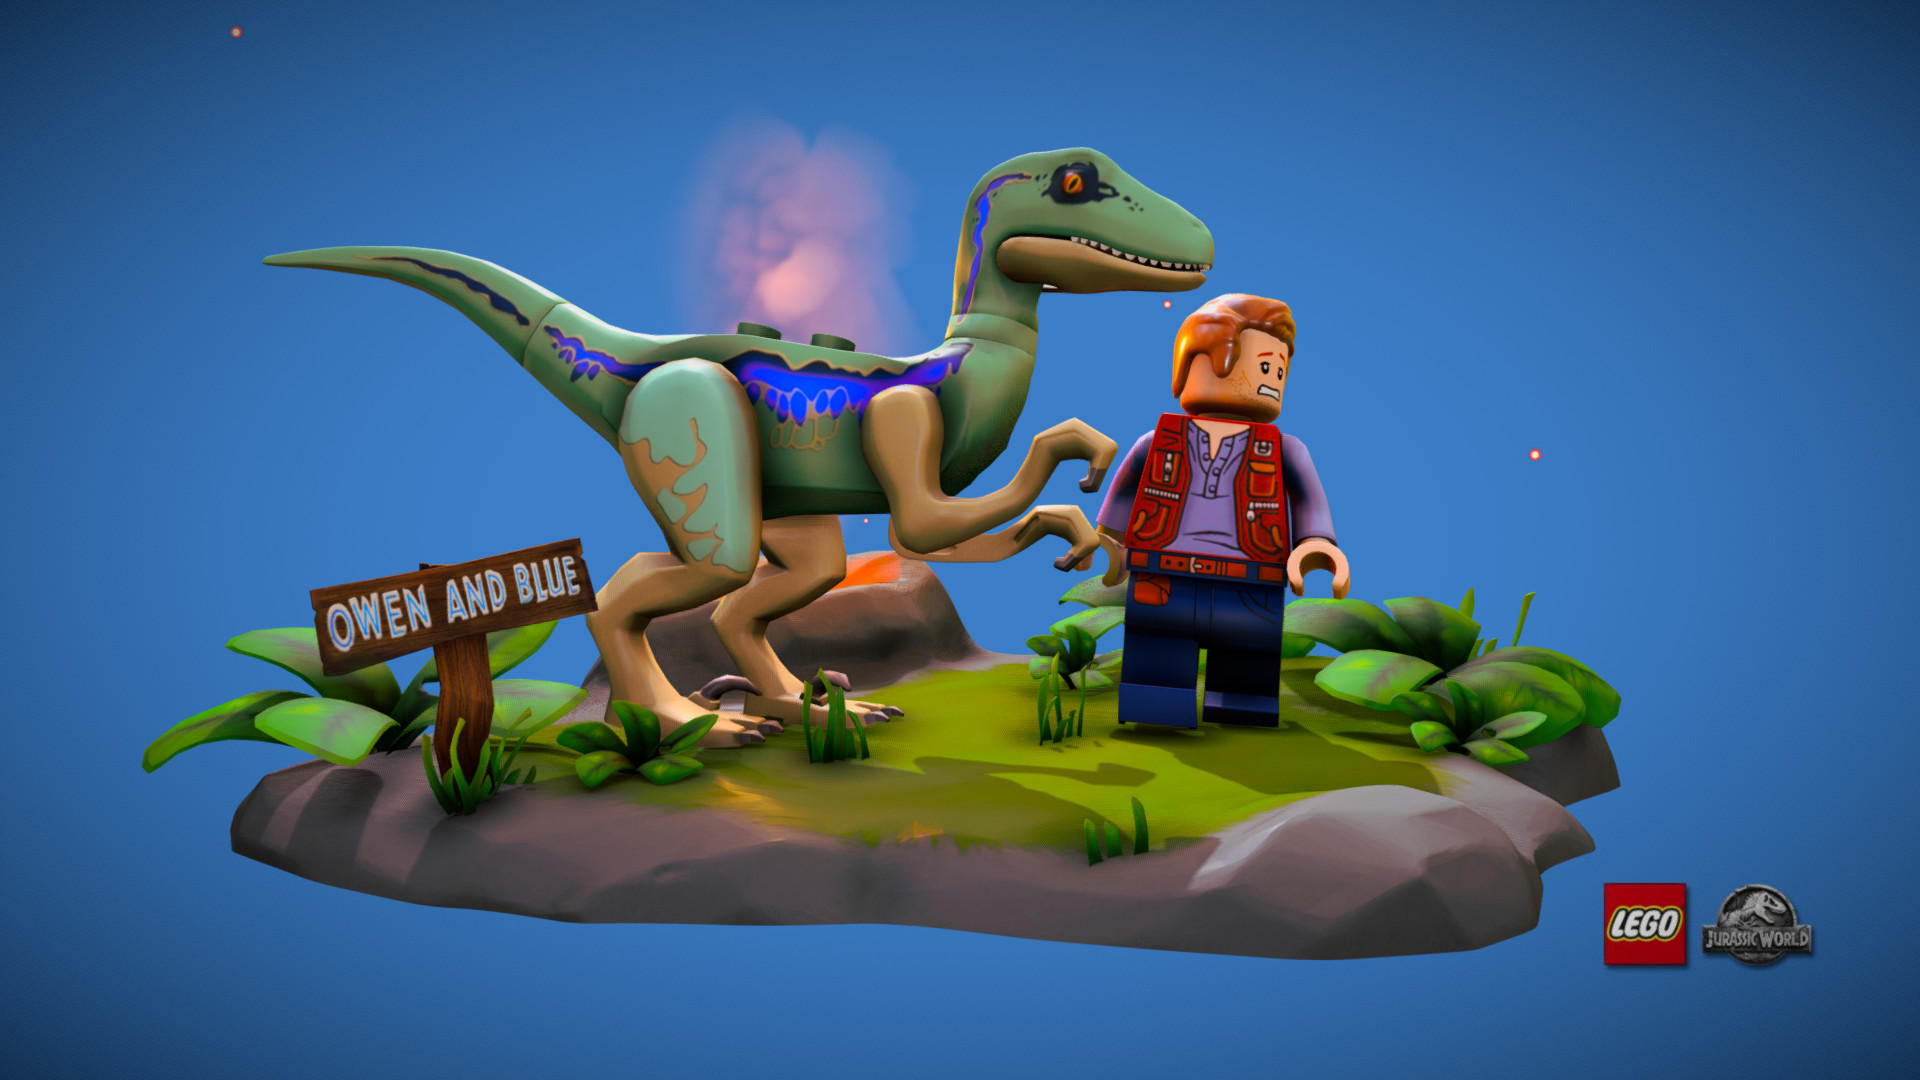 ArtStation - LEGO Jurassic World Fallen Kingdom Blue & Owen